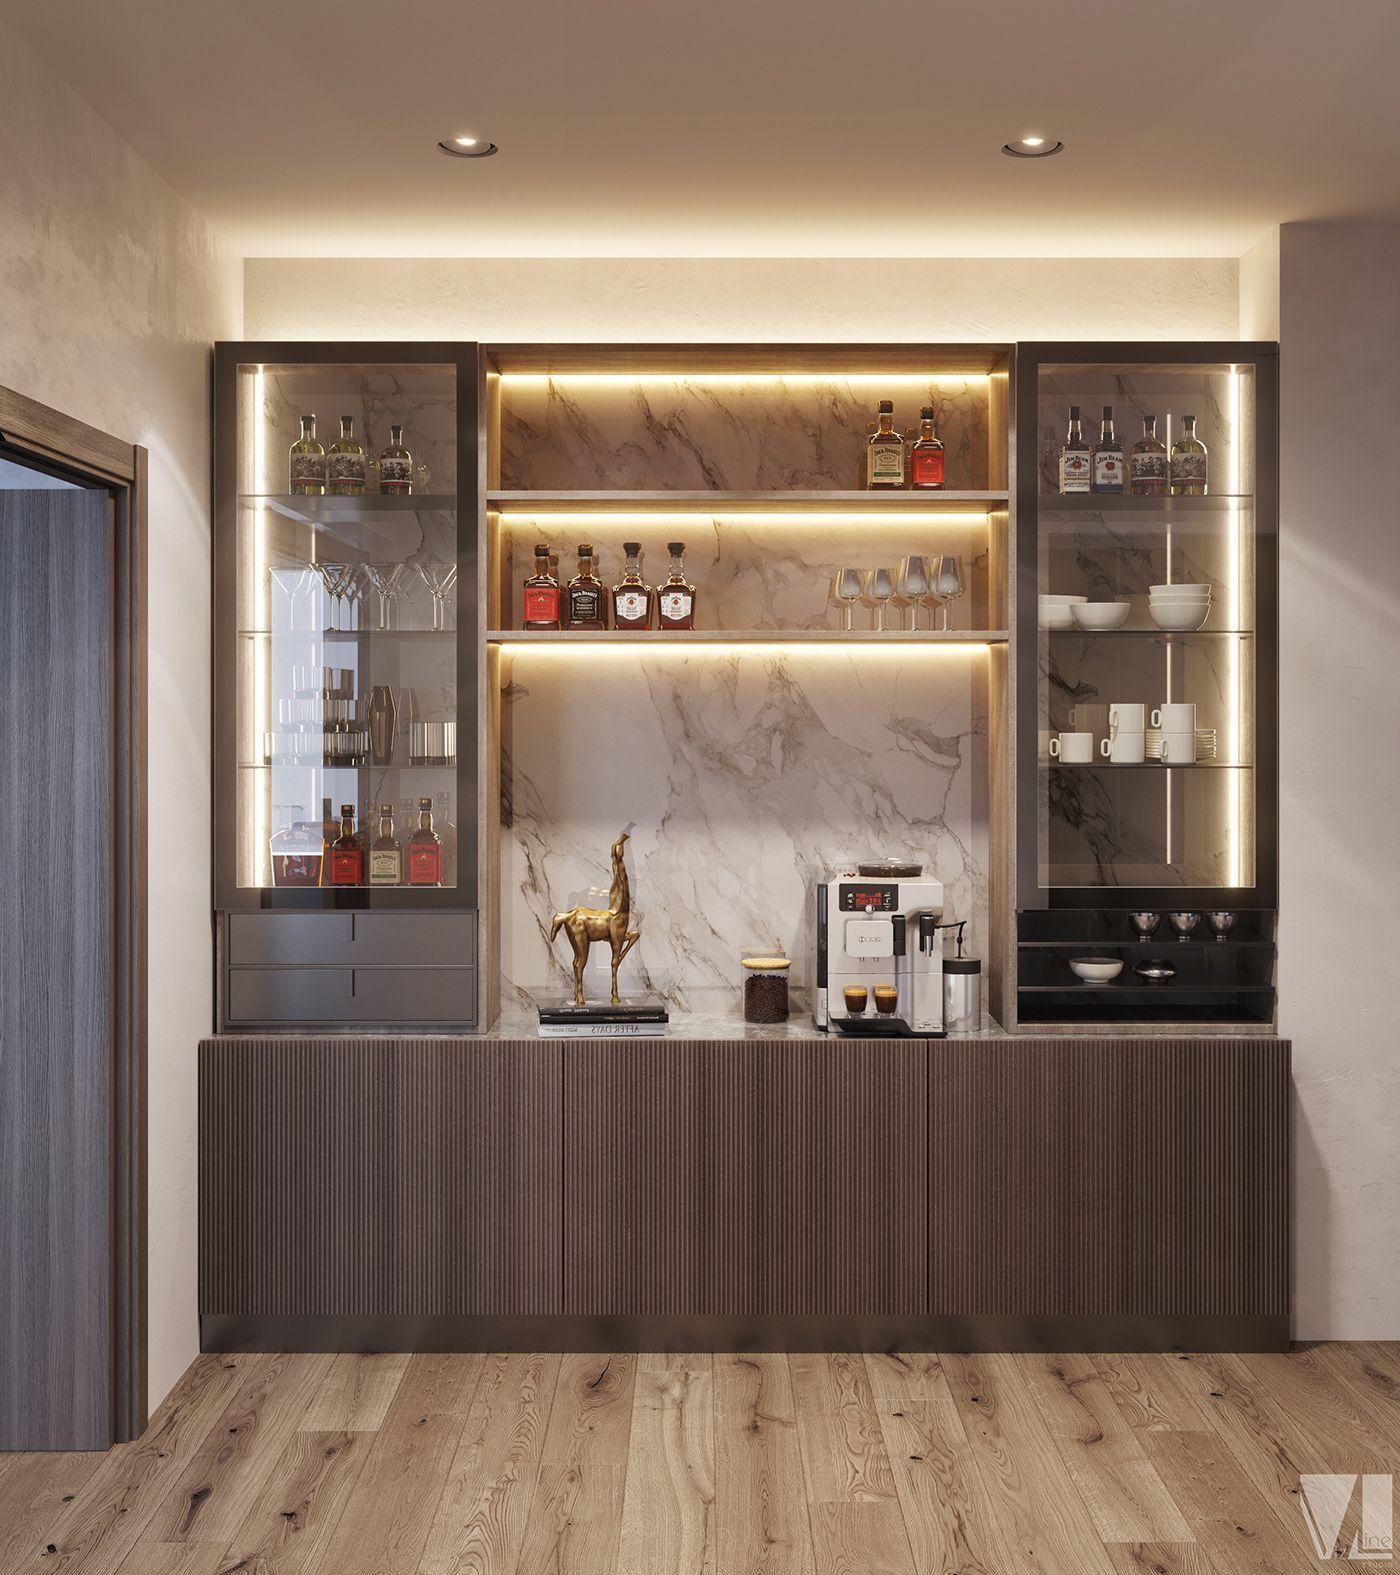 Interior Designers Of Canada: Beautiful Home Interior Private Apartment In Canada On